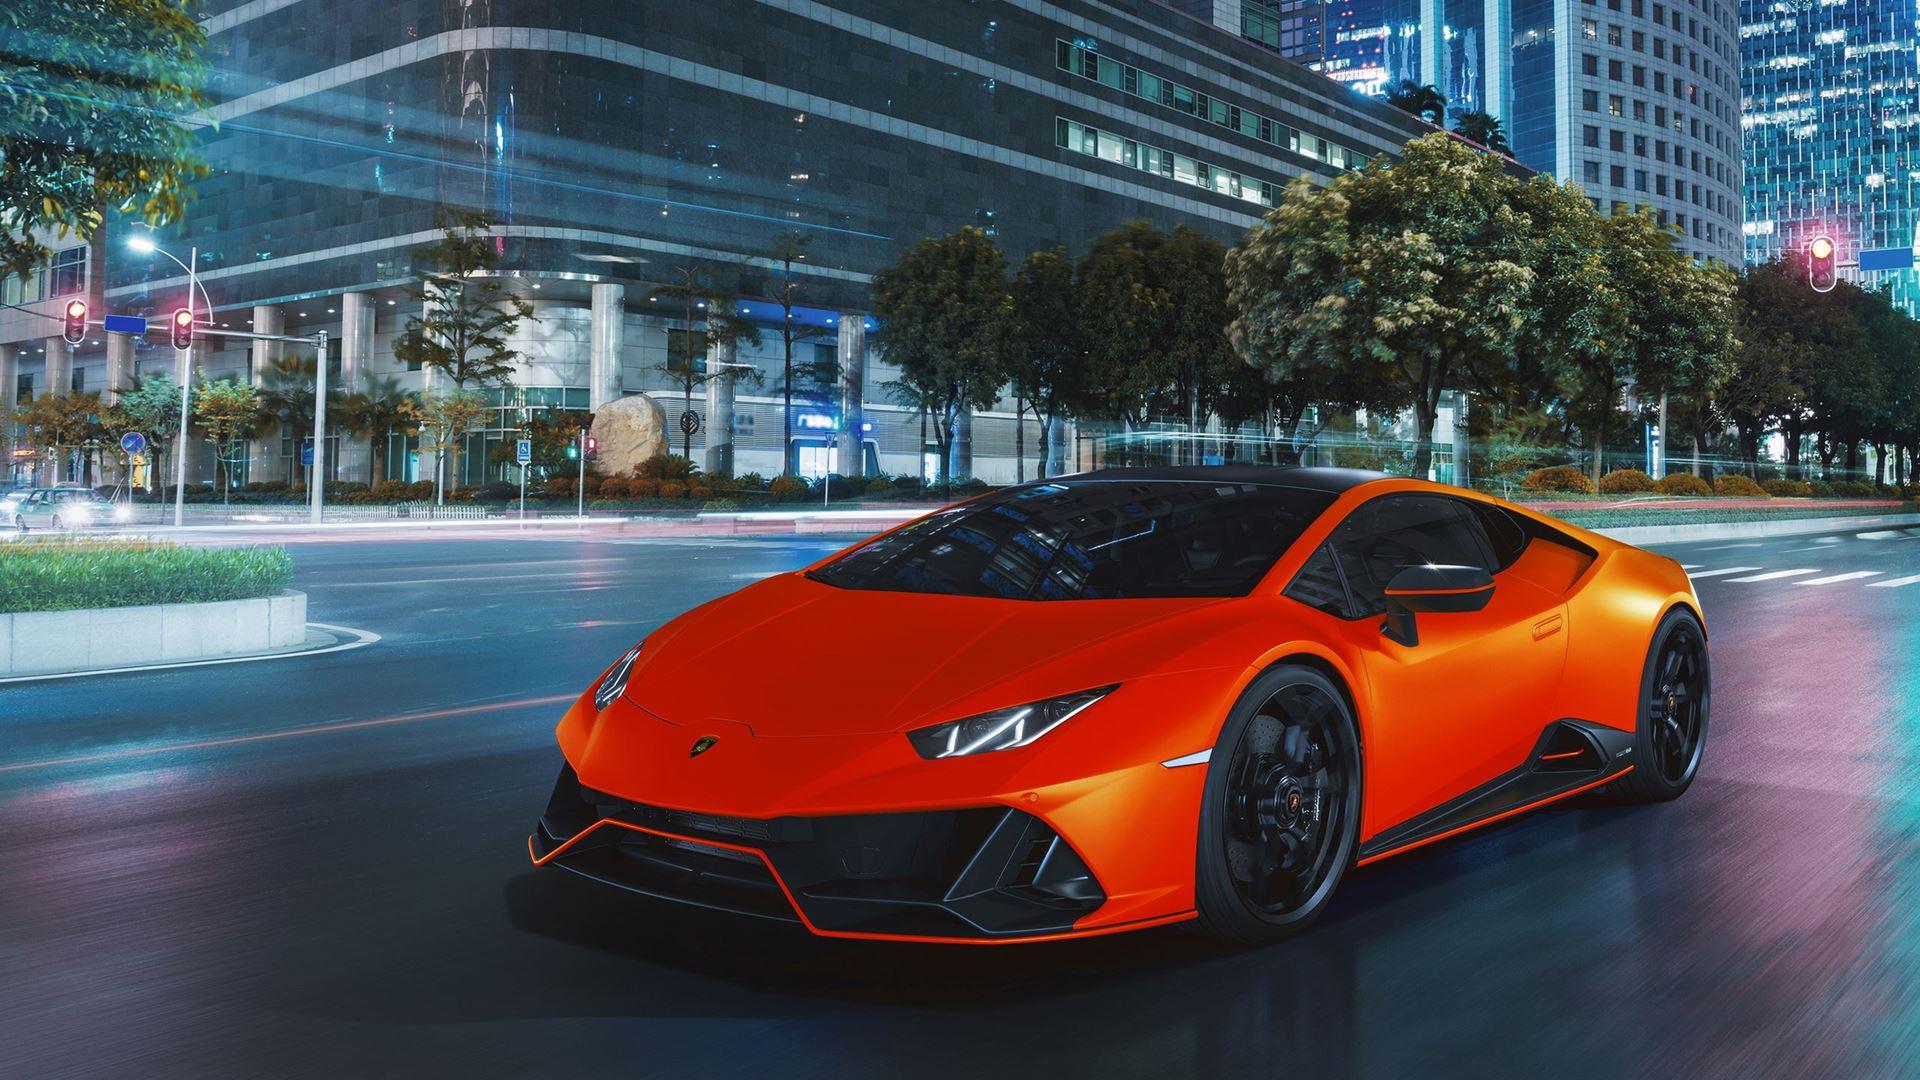 Daring elegance: Automobili Lamborghini presents the Huracán EVO Fluo Capsule - Image 4